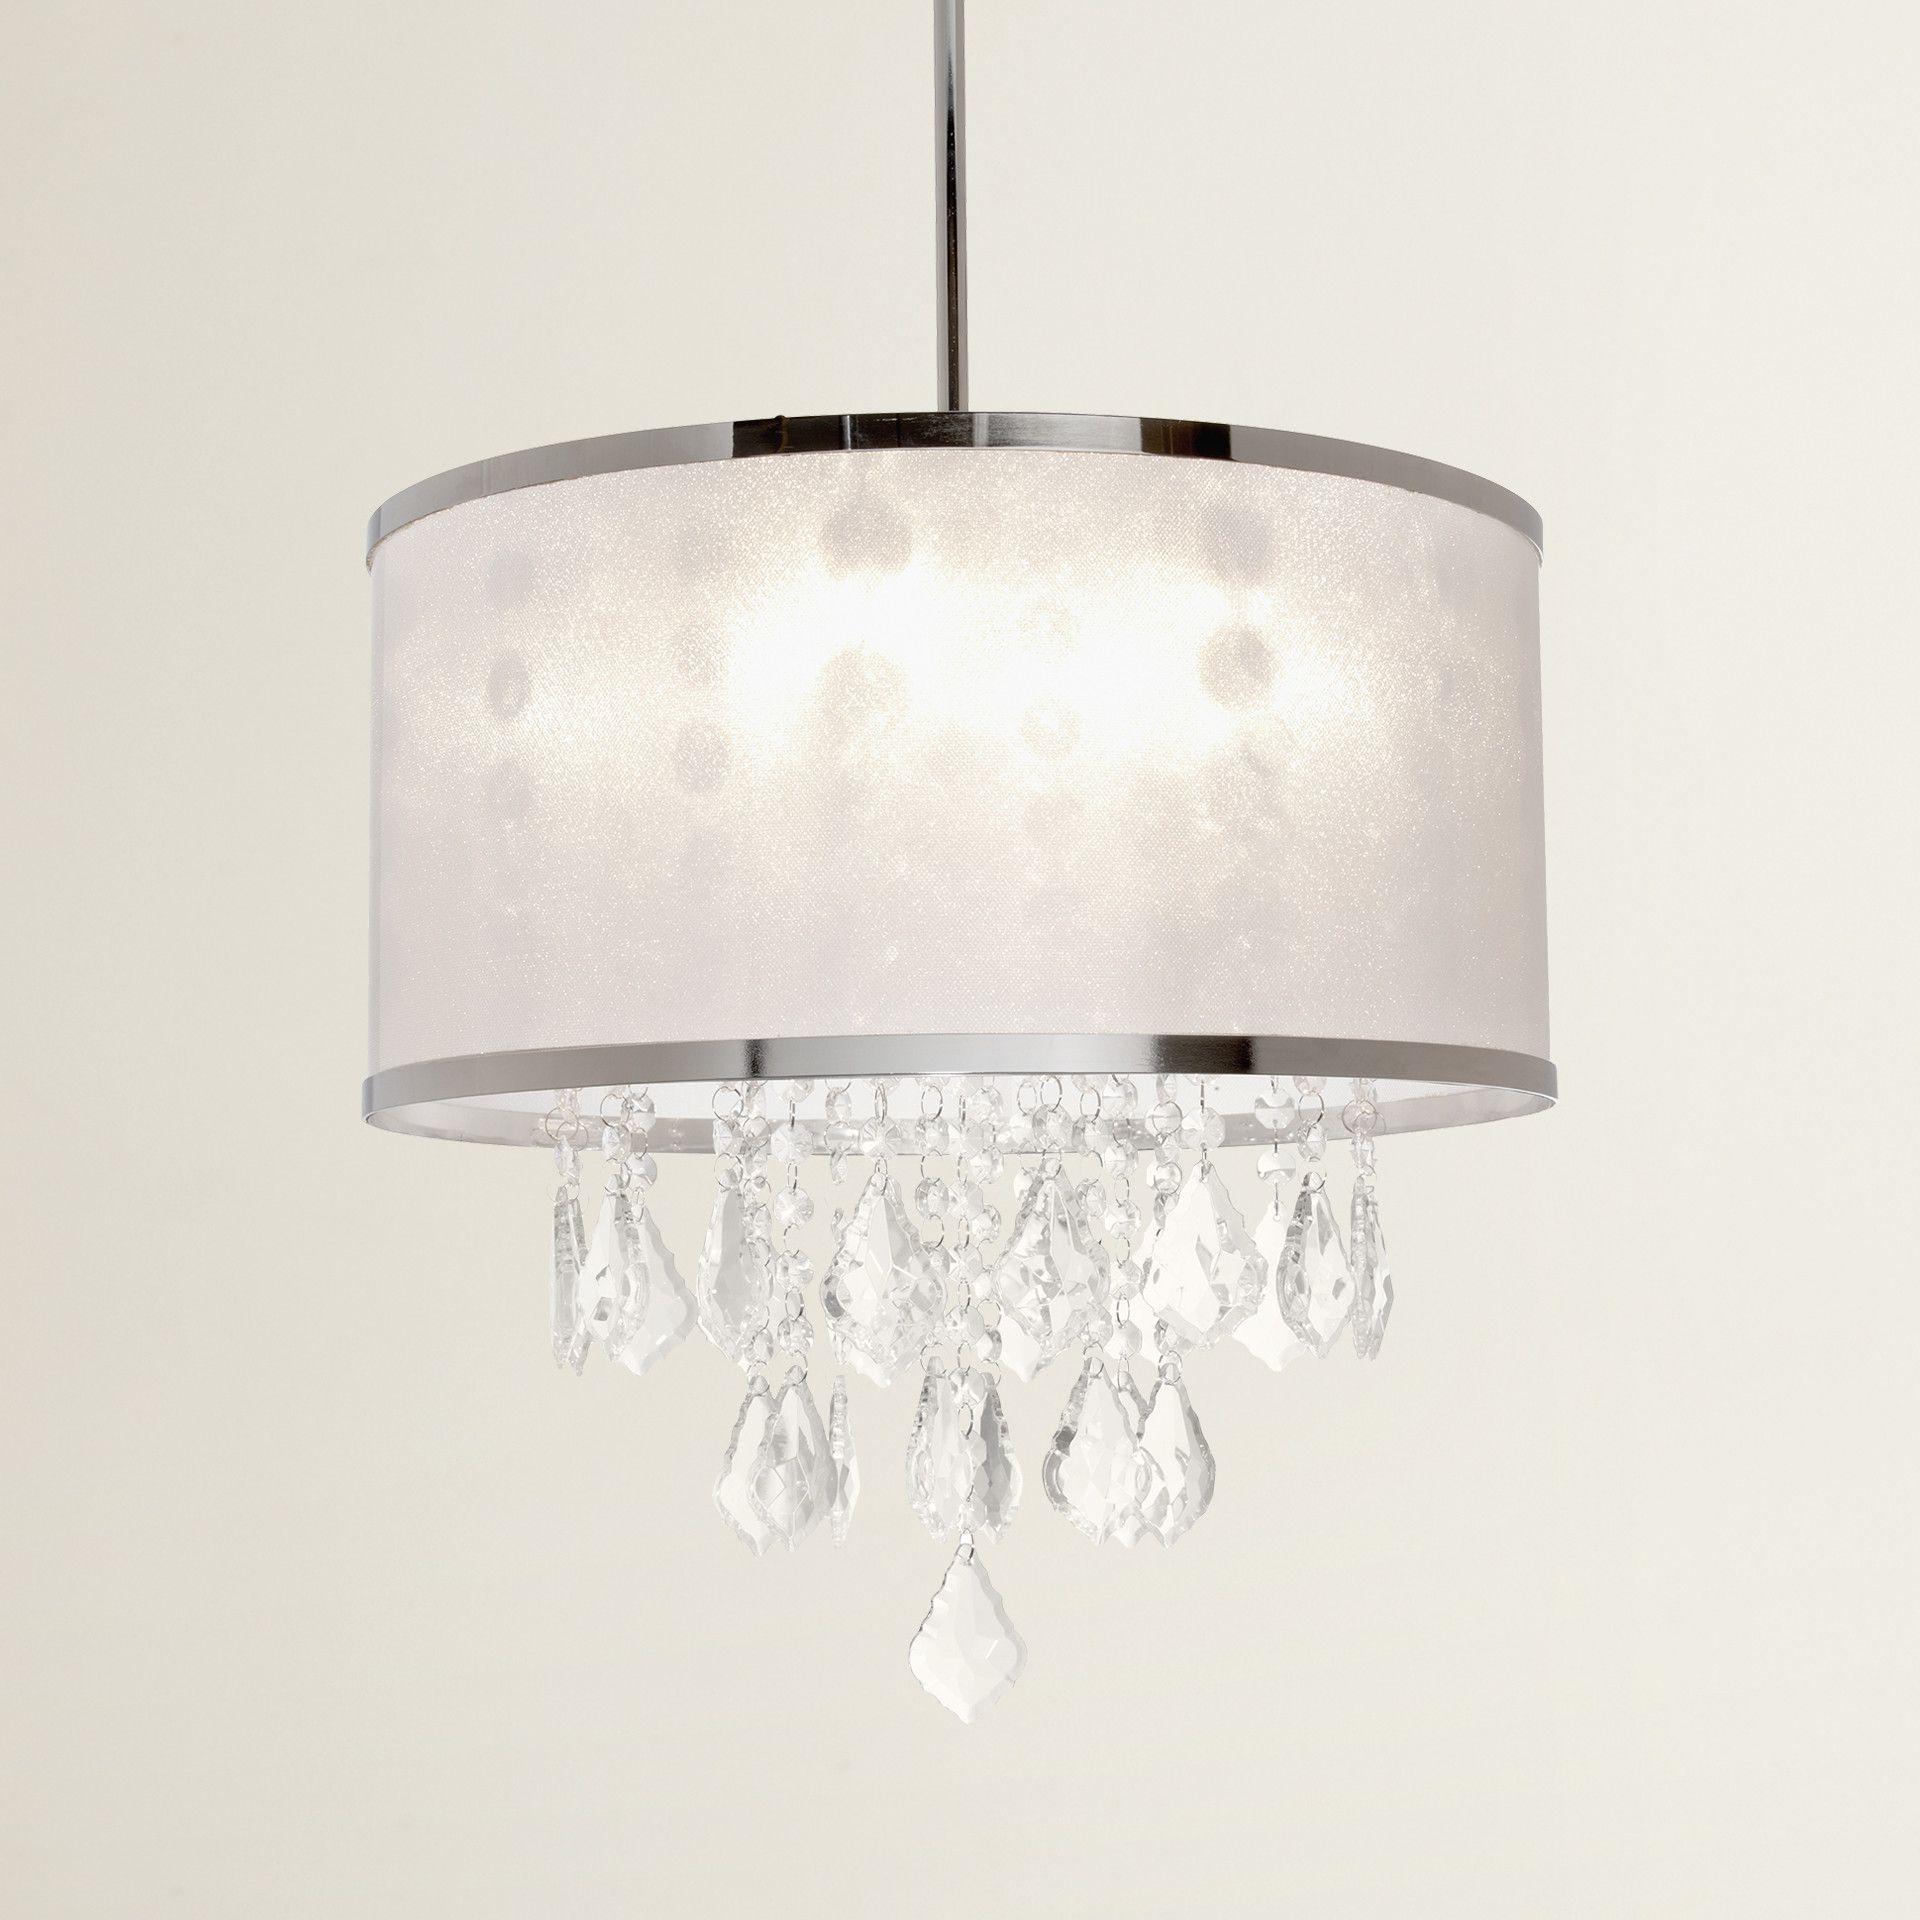 House Of Hampton® Leibowitz 4 Light Drum Chandelier Within Jill 4 Light Drum Chandeliers (View 9 of 30)